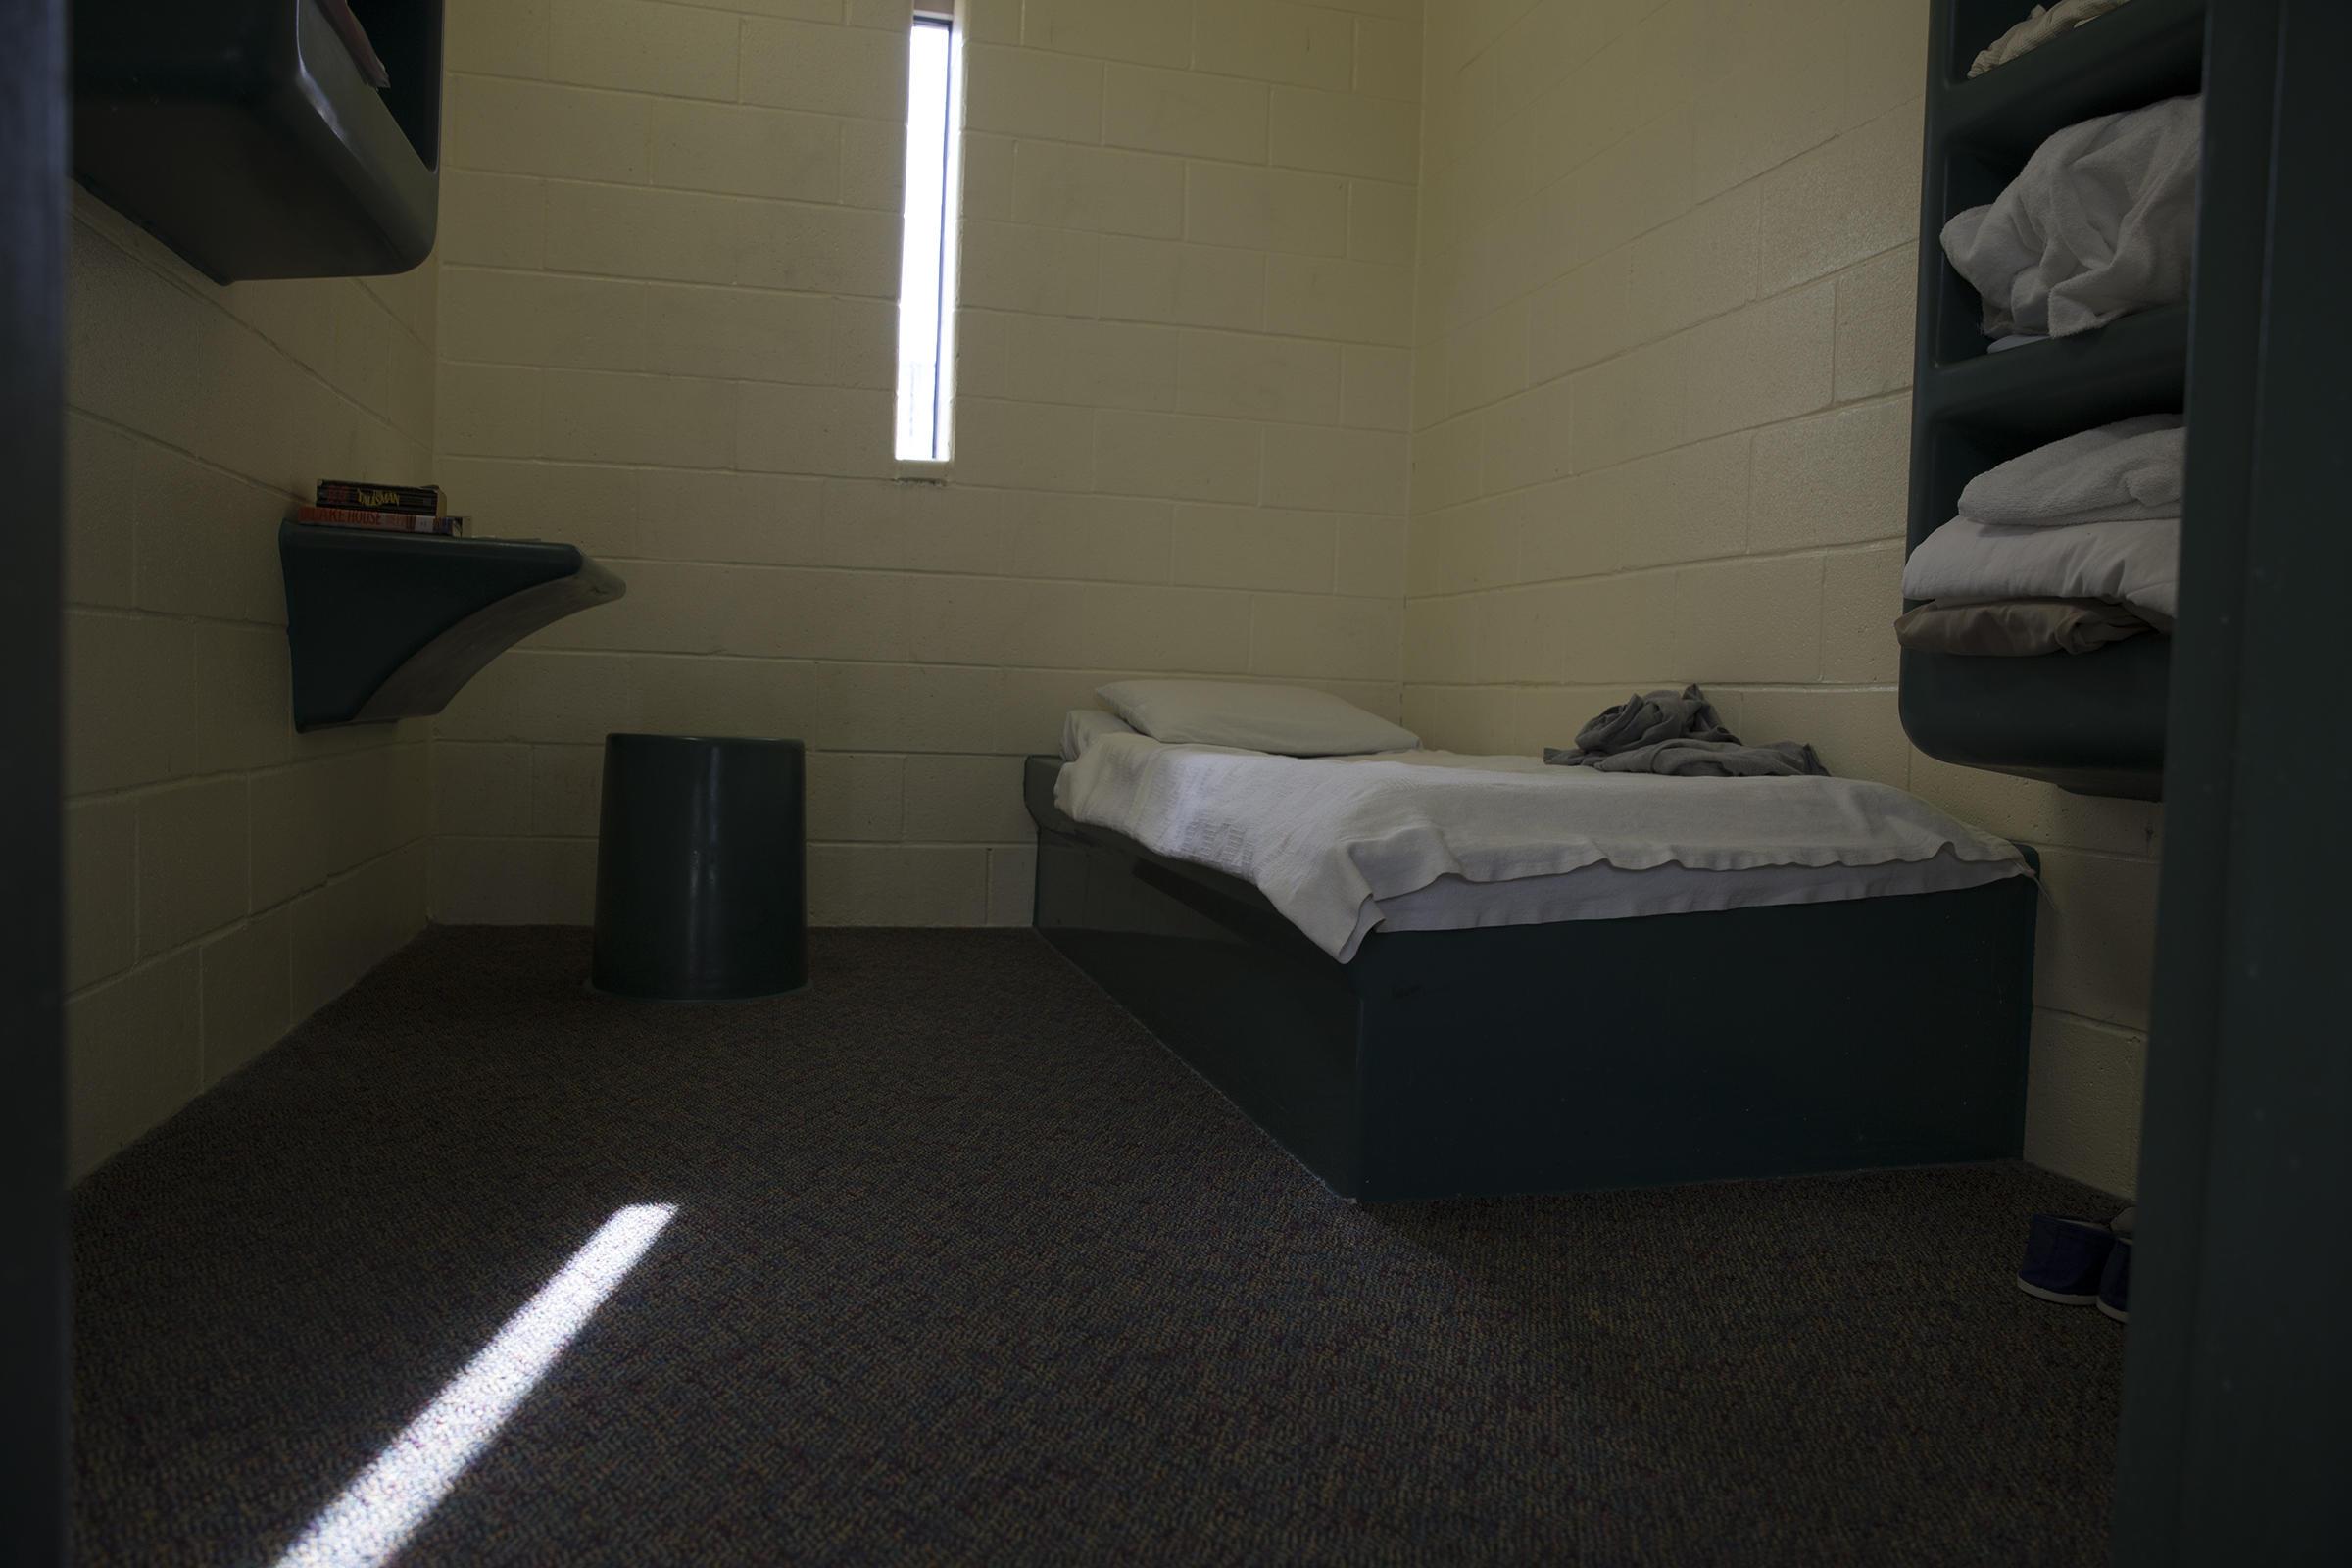 Inside the embattled Connecticut Juvenile Training School